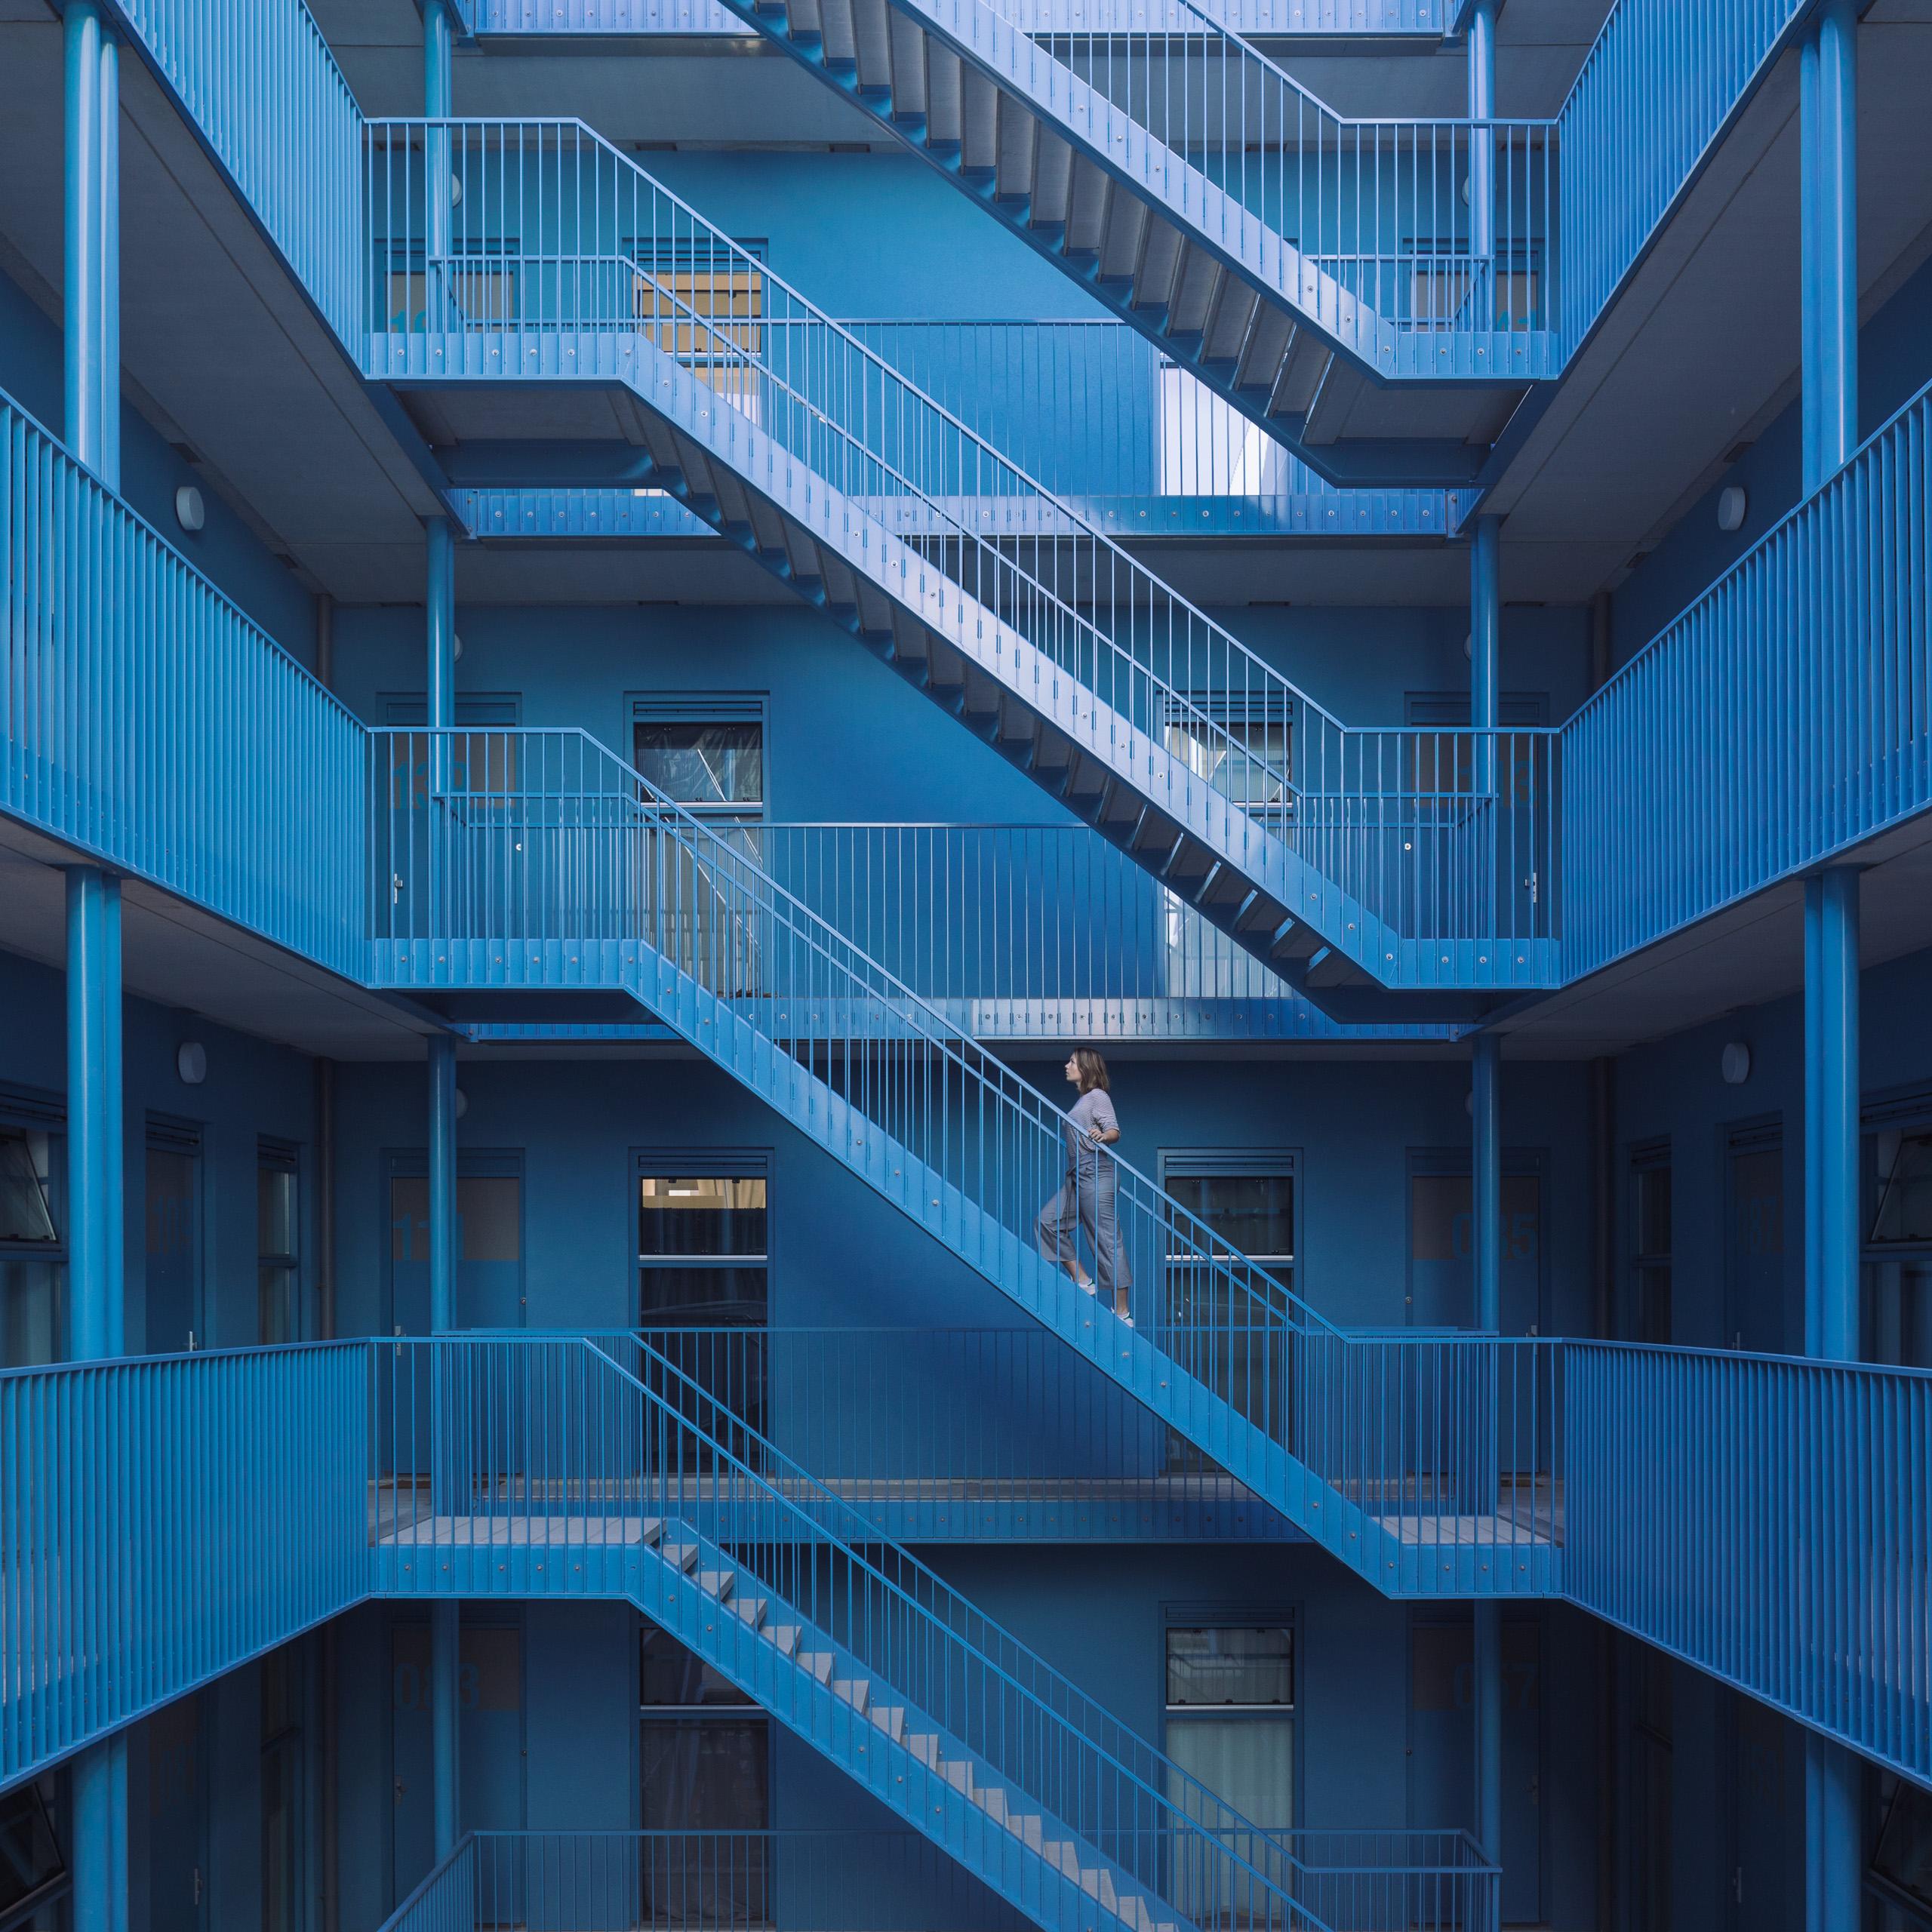 Eindhoven Strijp-S fabrieksarchitectuur lofts loftwonen baksteenarchitectuur vakmanschap blauw binnenruimte trappen woongebouw blok 61 fabrieksgebouw rode baksteen binnenhof blauw binnenhof blauw atrium hemelsblauw Cubies